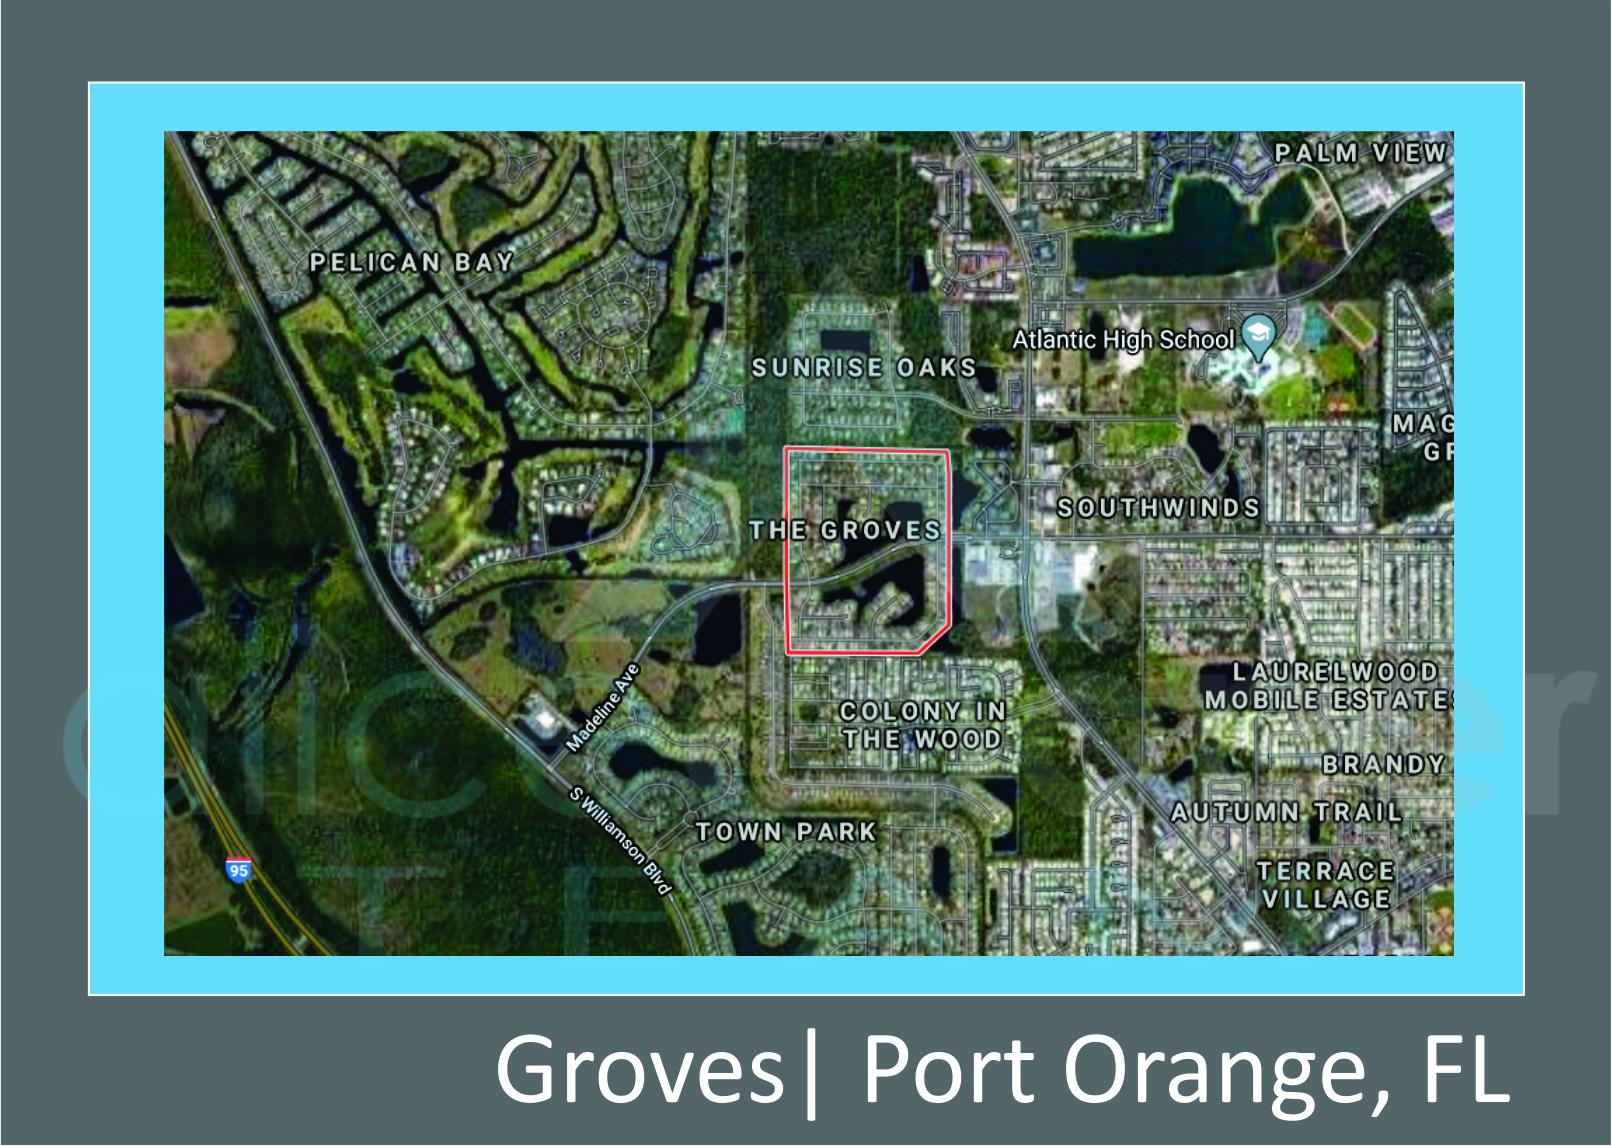 Map of The Groves in Port Orange, FL